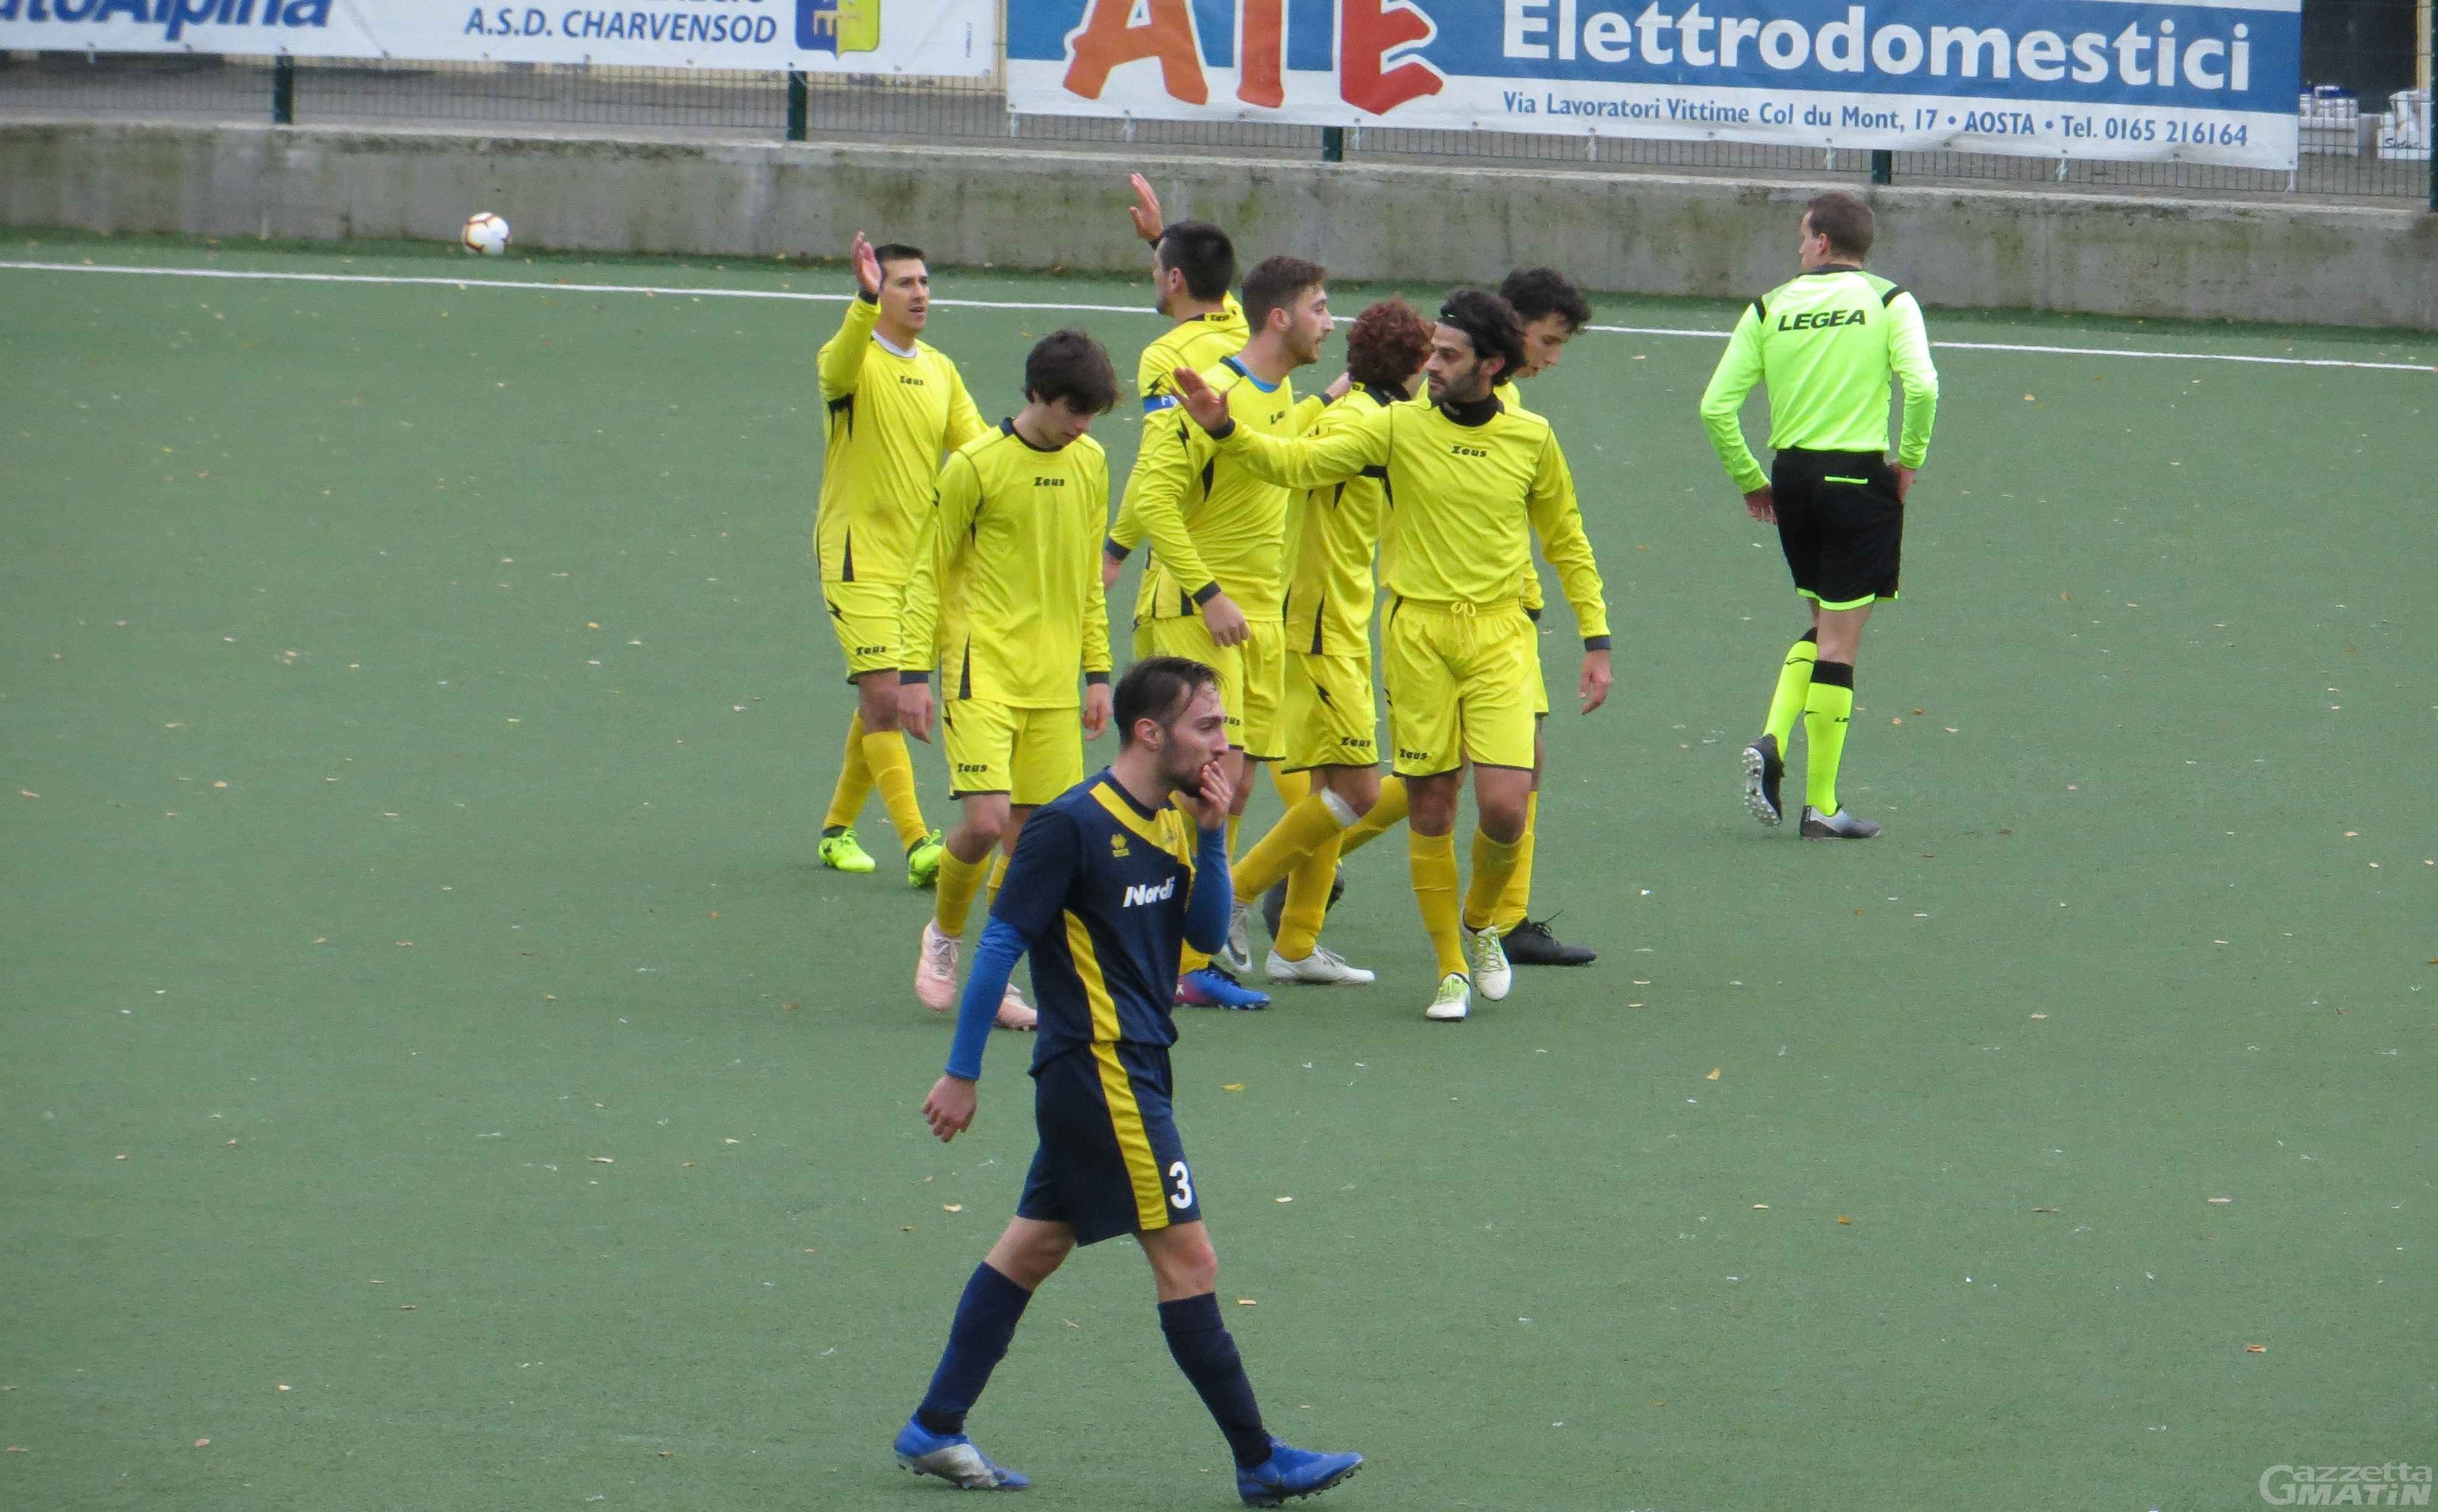 Calcio: cadono Aygre e P.D.H.A.E.; vince lo Charvensod